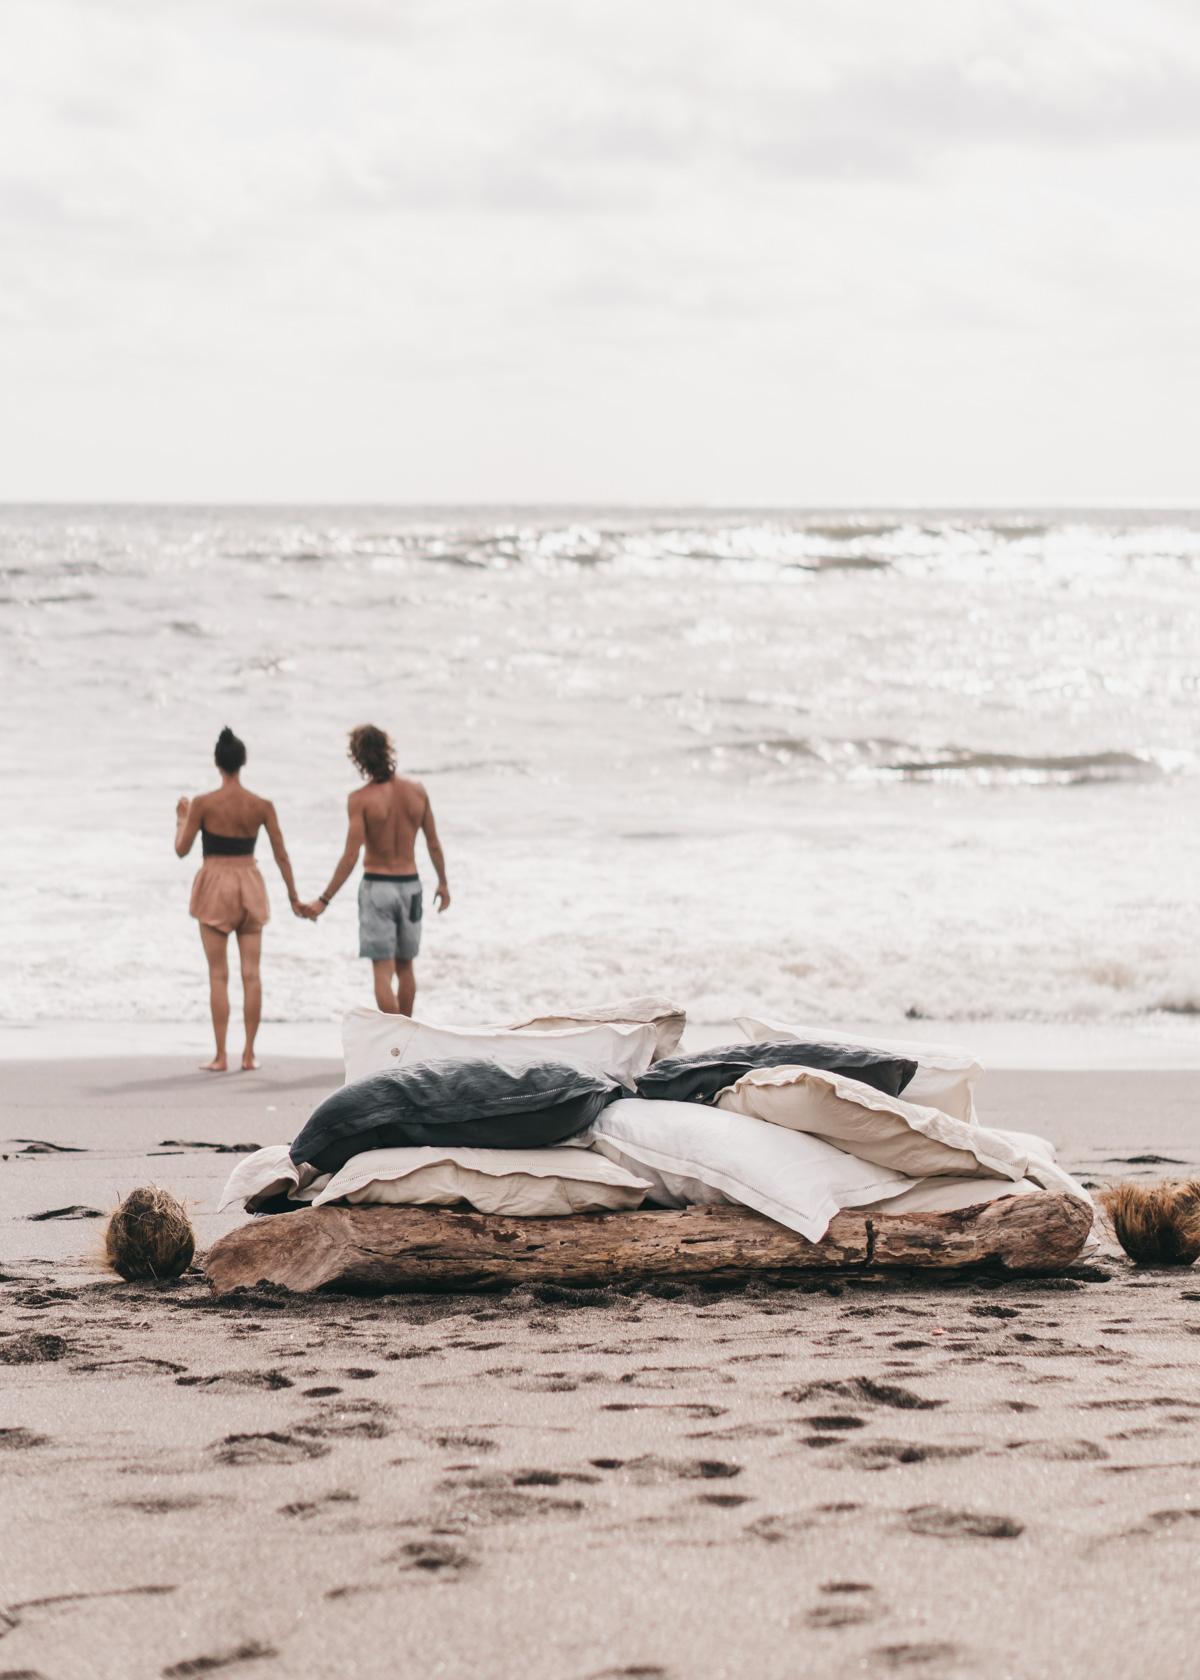 Keira-Mason-in-between-the-sheets-couple-at-beach.jpg